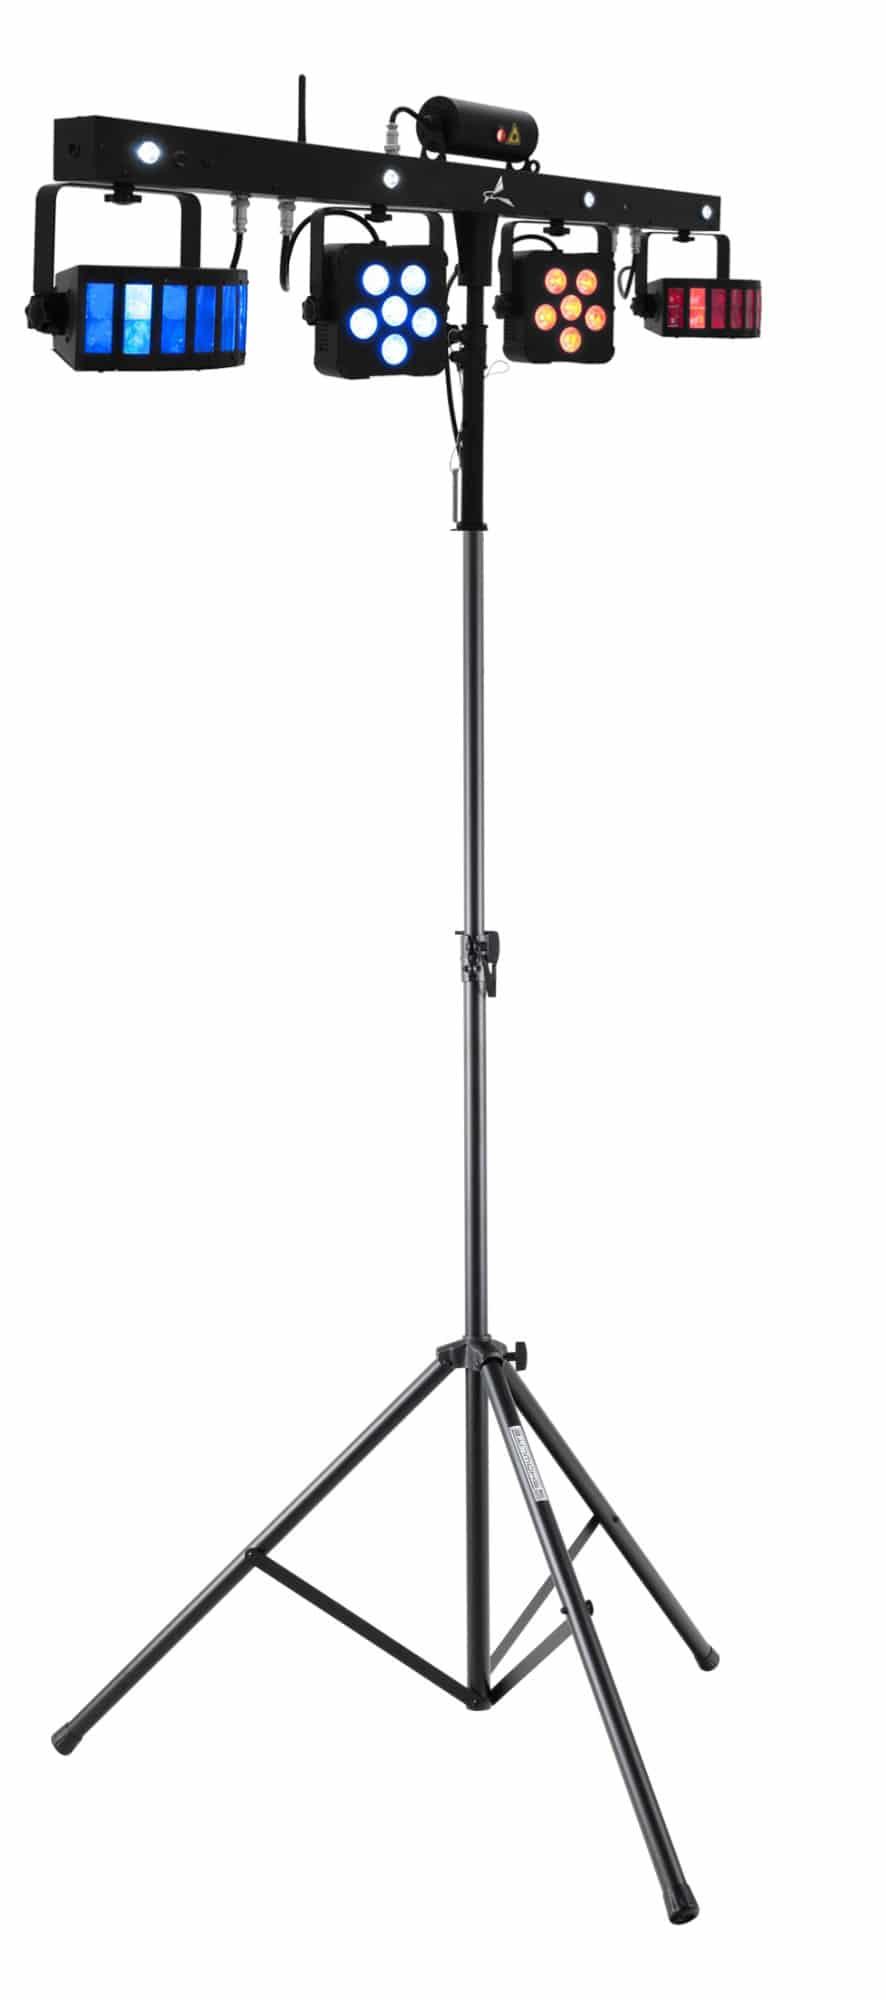 Lichtsets - Eurolite LED KLS Laser Bar Pro FX Lichtset mit Stativ - Onlineshop Musikhaus Kirstein